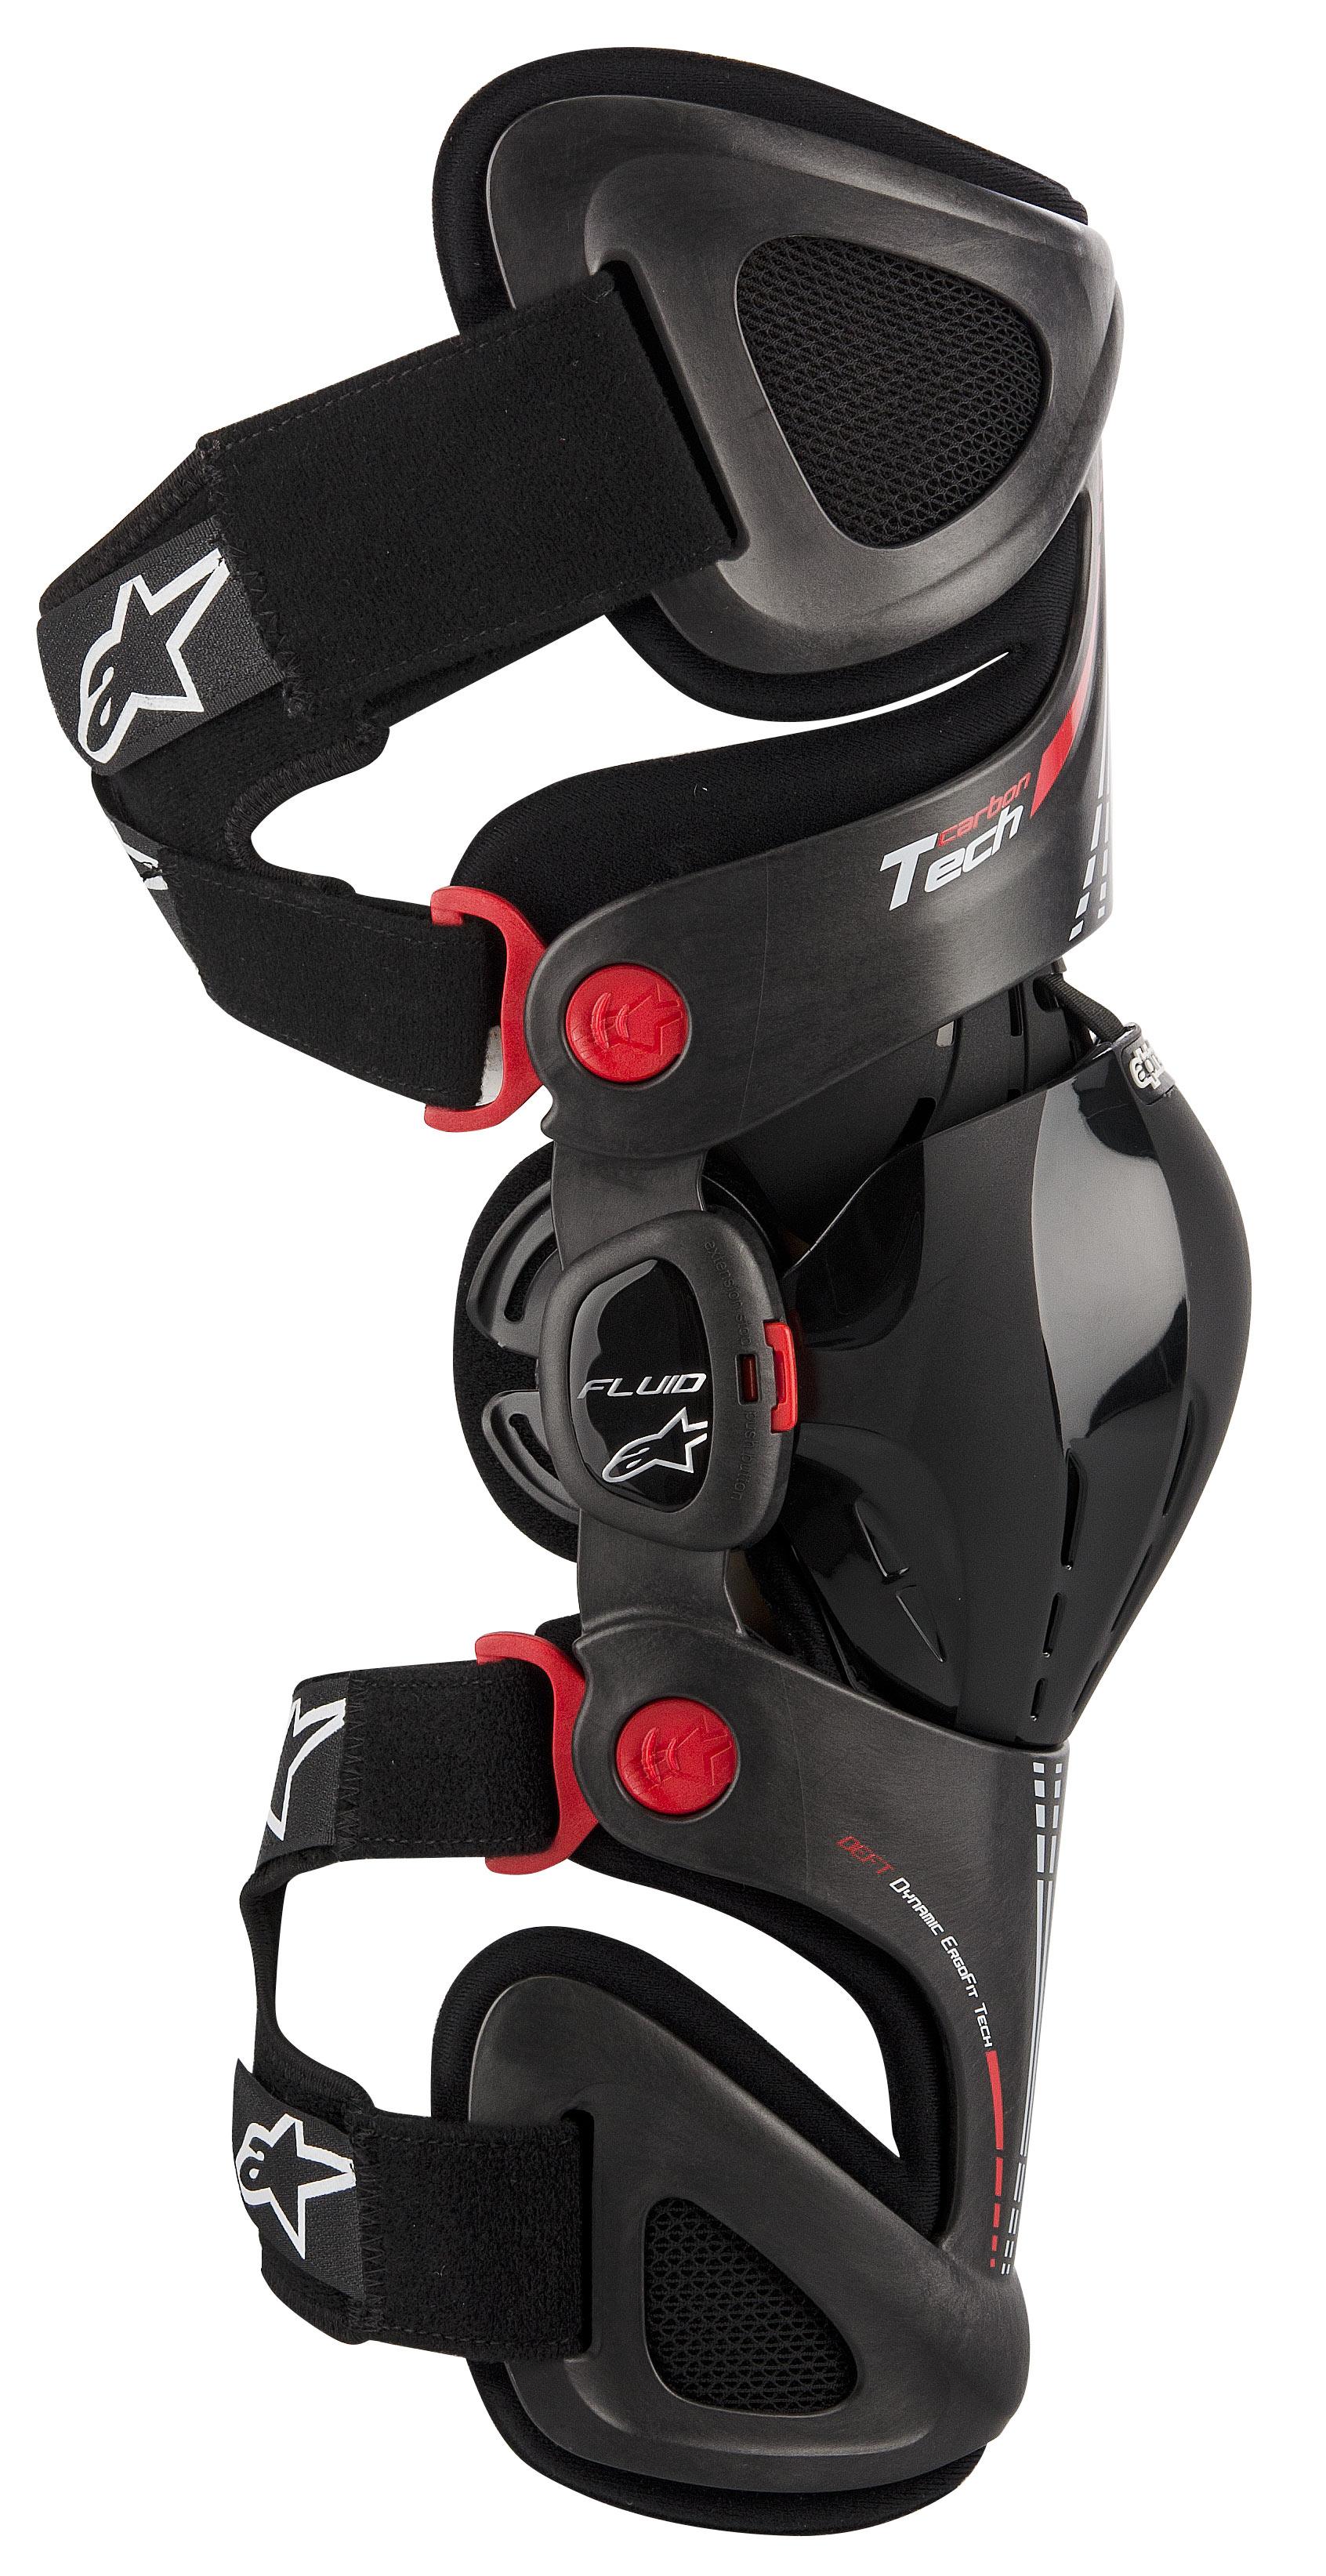 Mx Knee Braces >> Alpinestars Fluid Tech Carbon Knee Braces